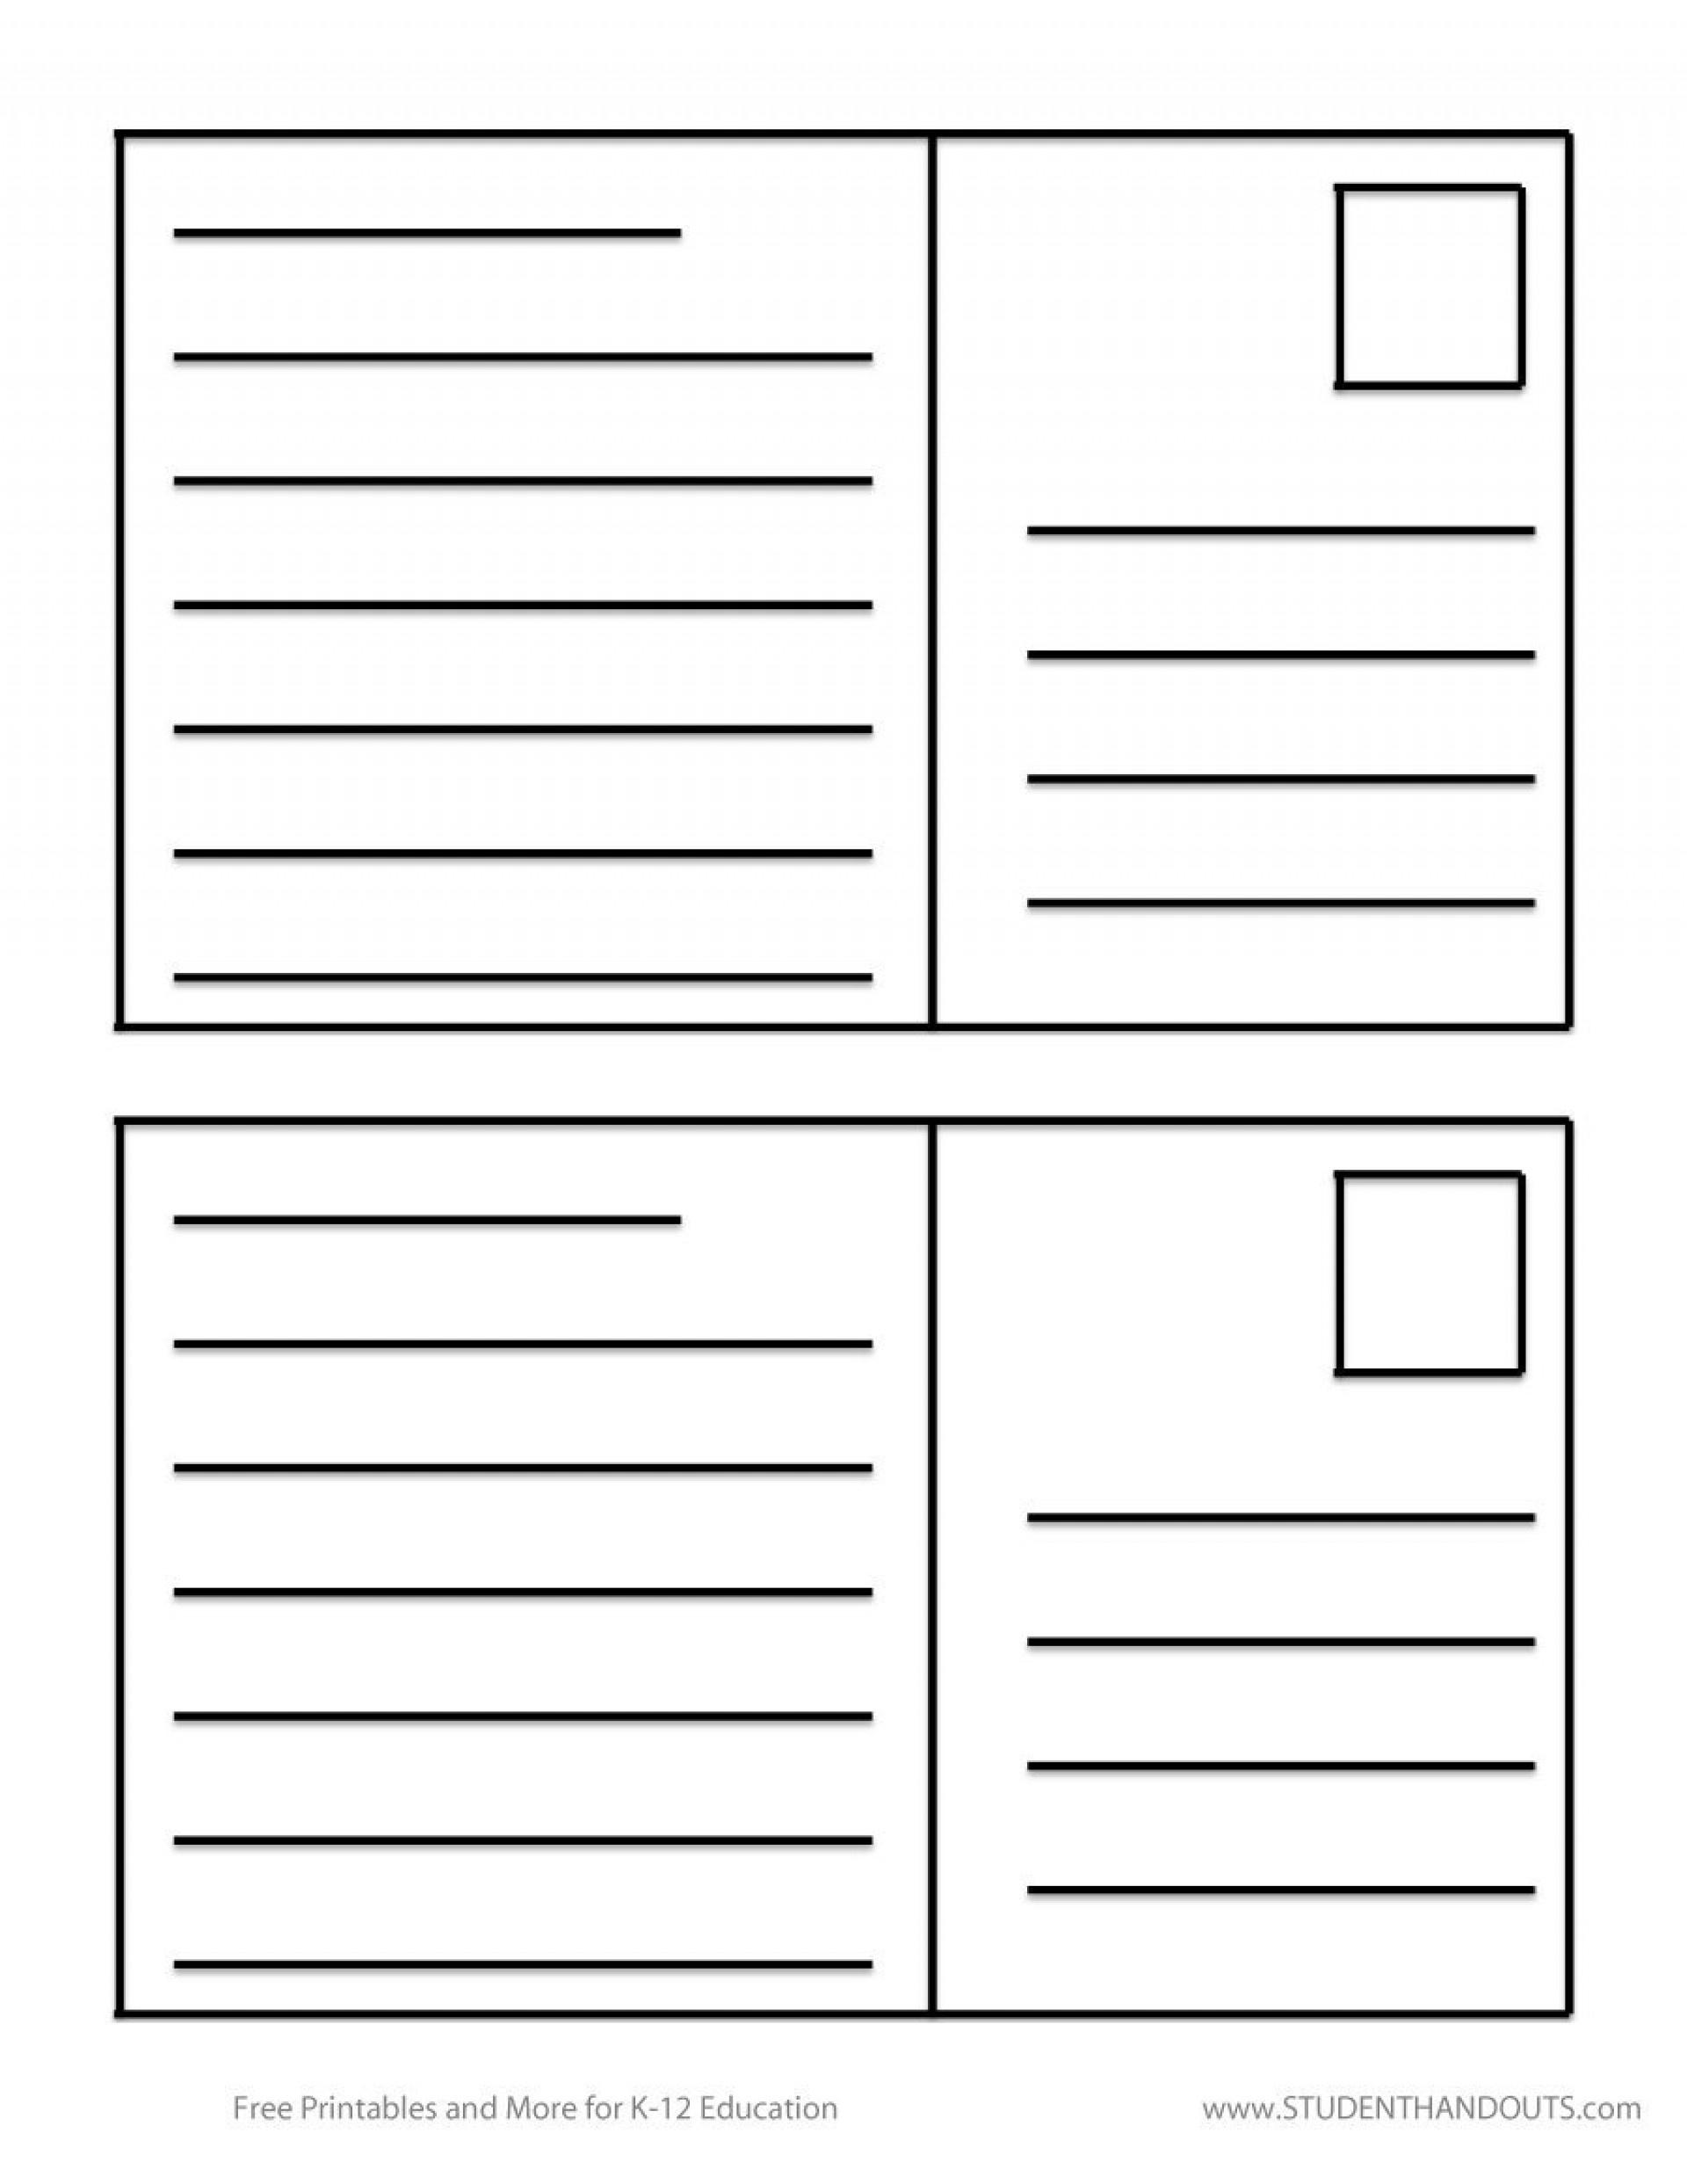 006 Free Printable Postcard Template Sample 7Ey22 Templates Imposing - Free Printable Postcard Template